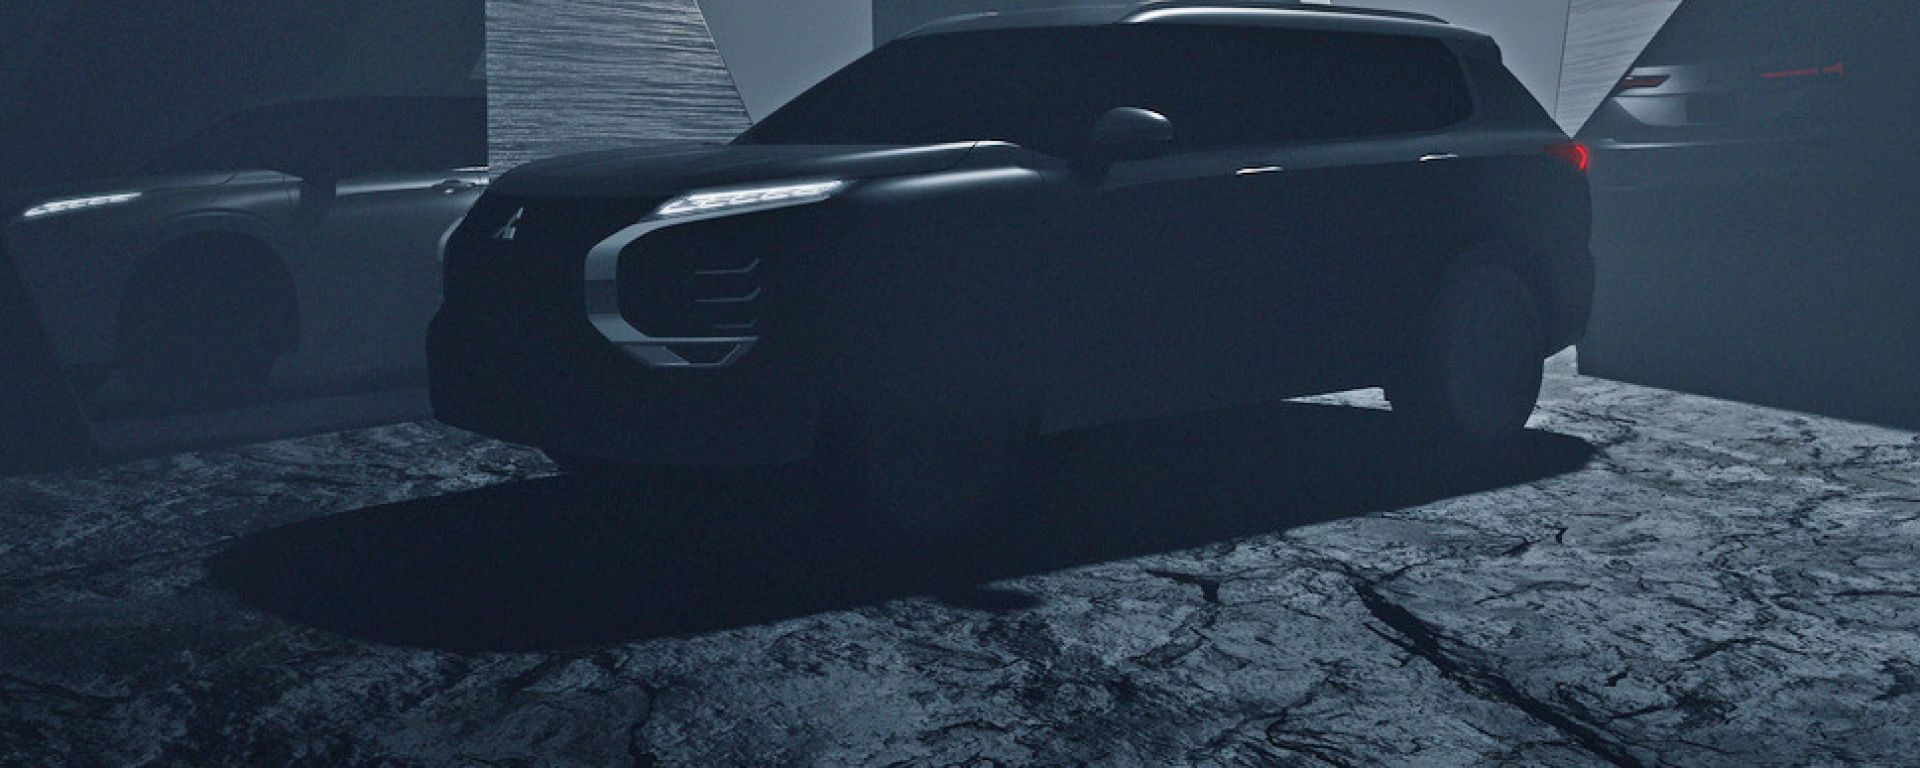 Nuovo Mitsubishi Outlander, primo teaser